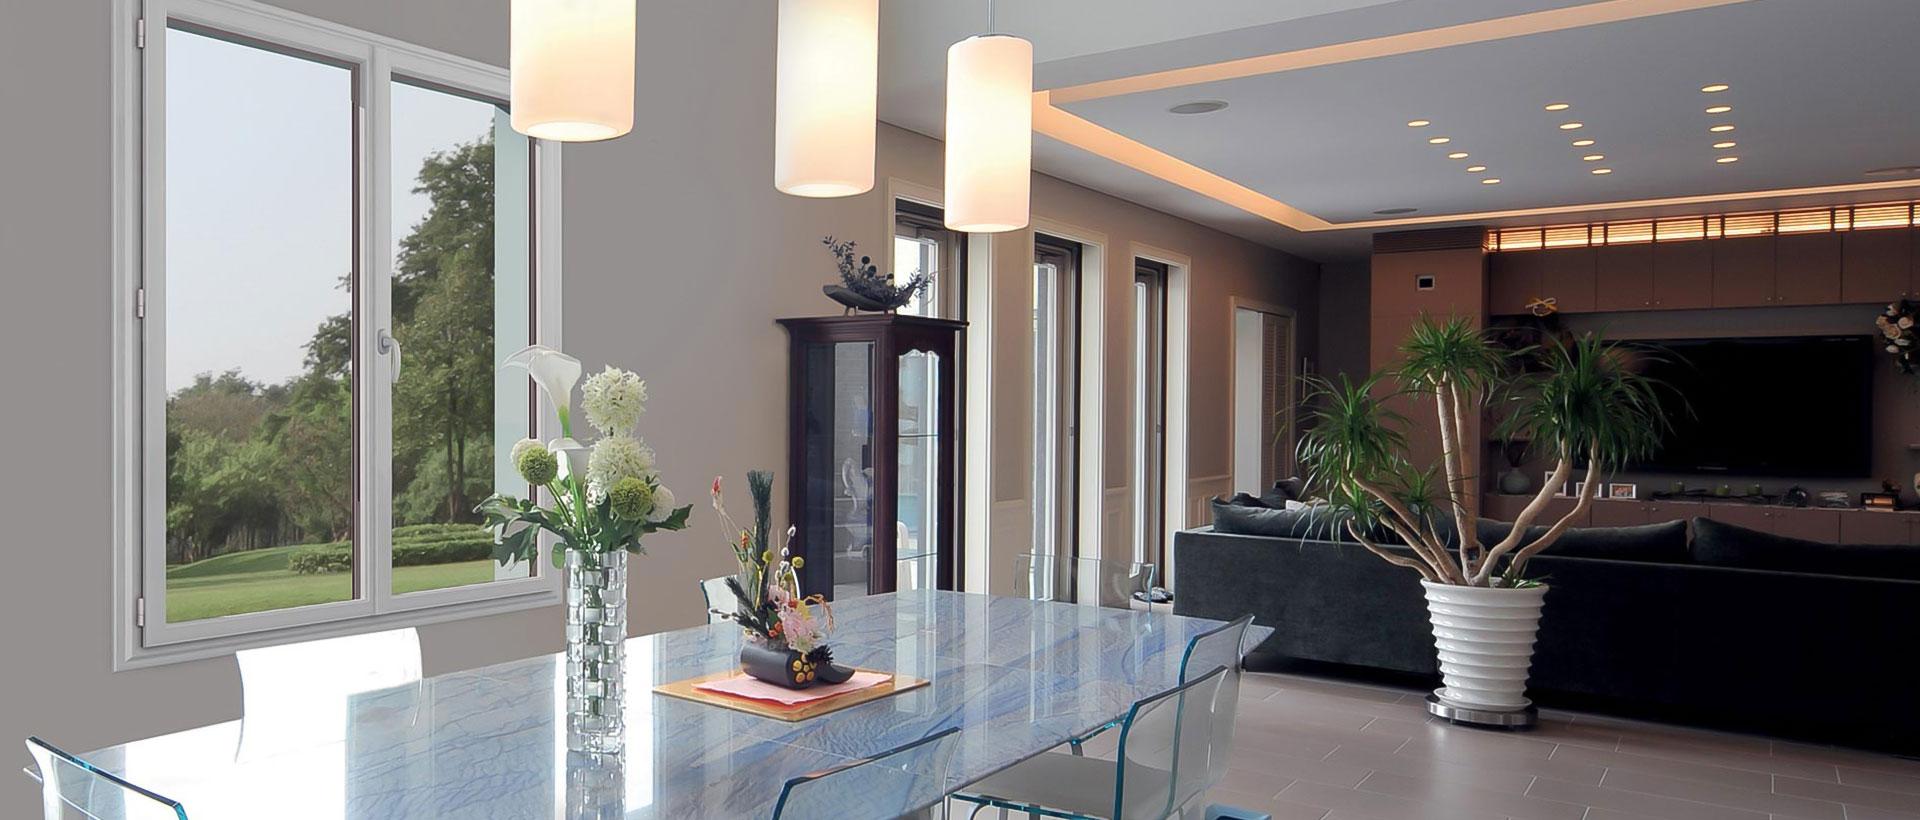 menuiserie pvc brest guipavas mvm. Black Bedroom Furniture Sets. Home Design Ideas